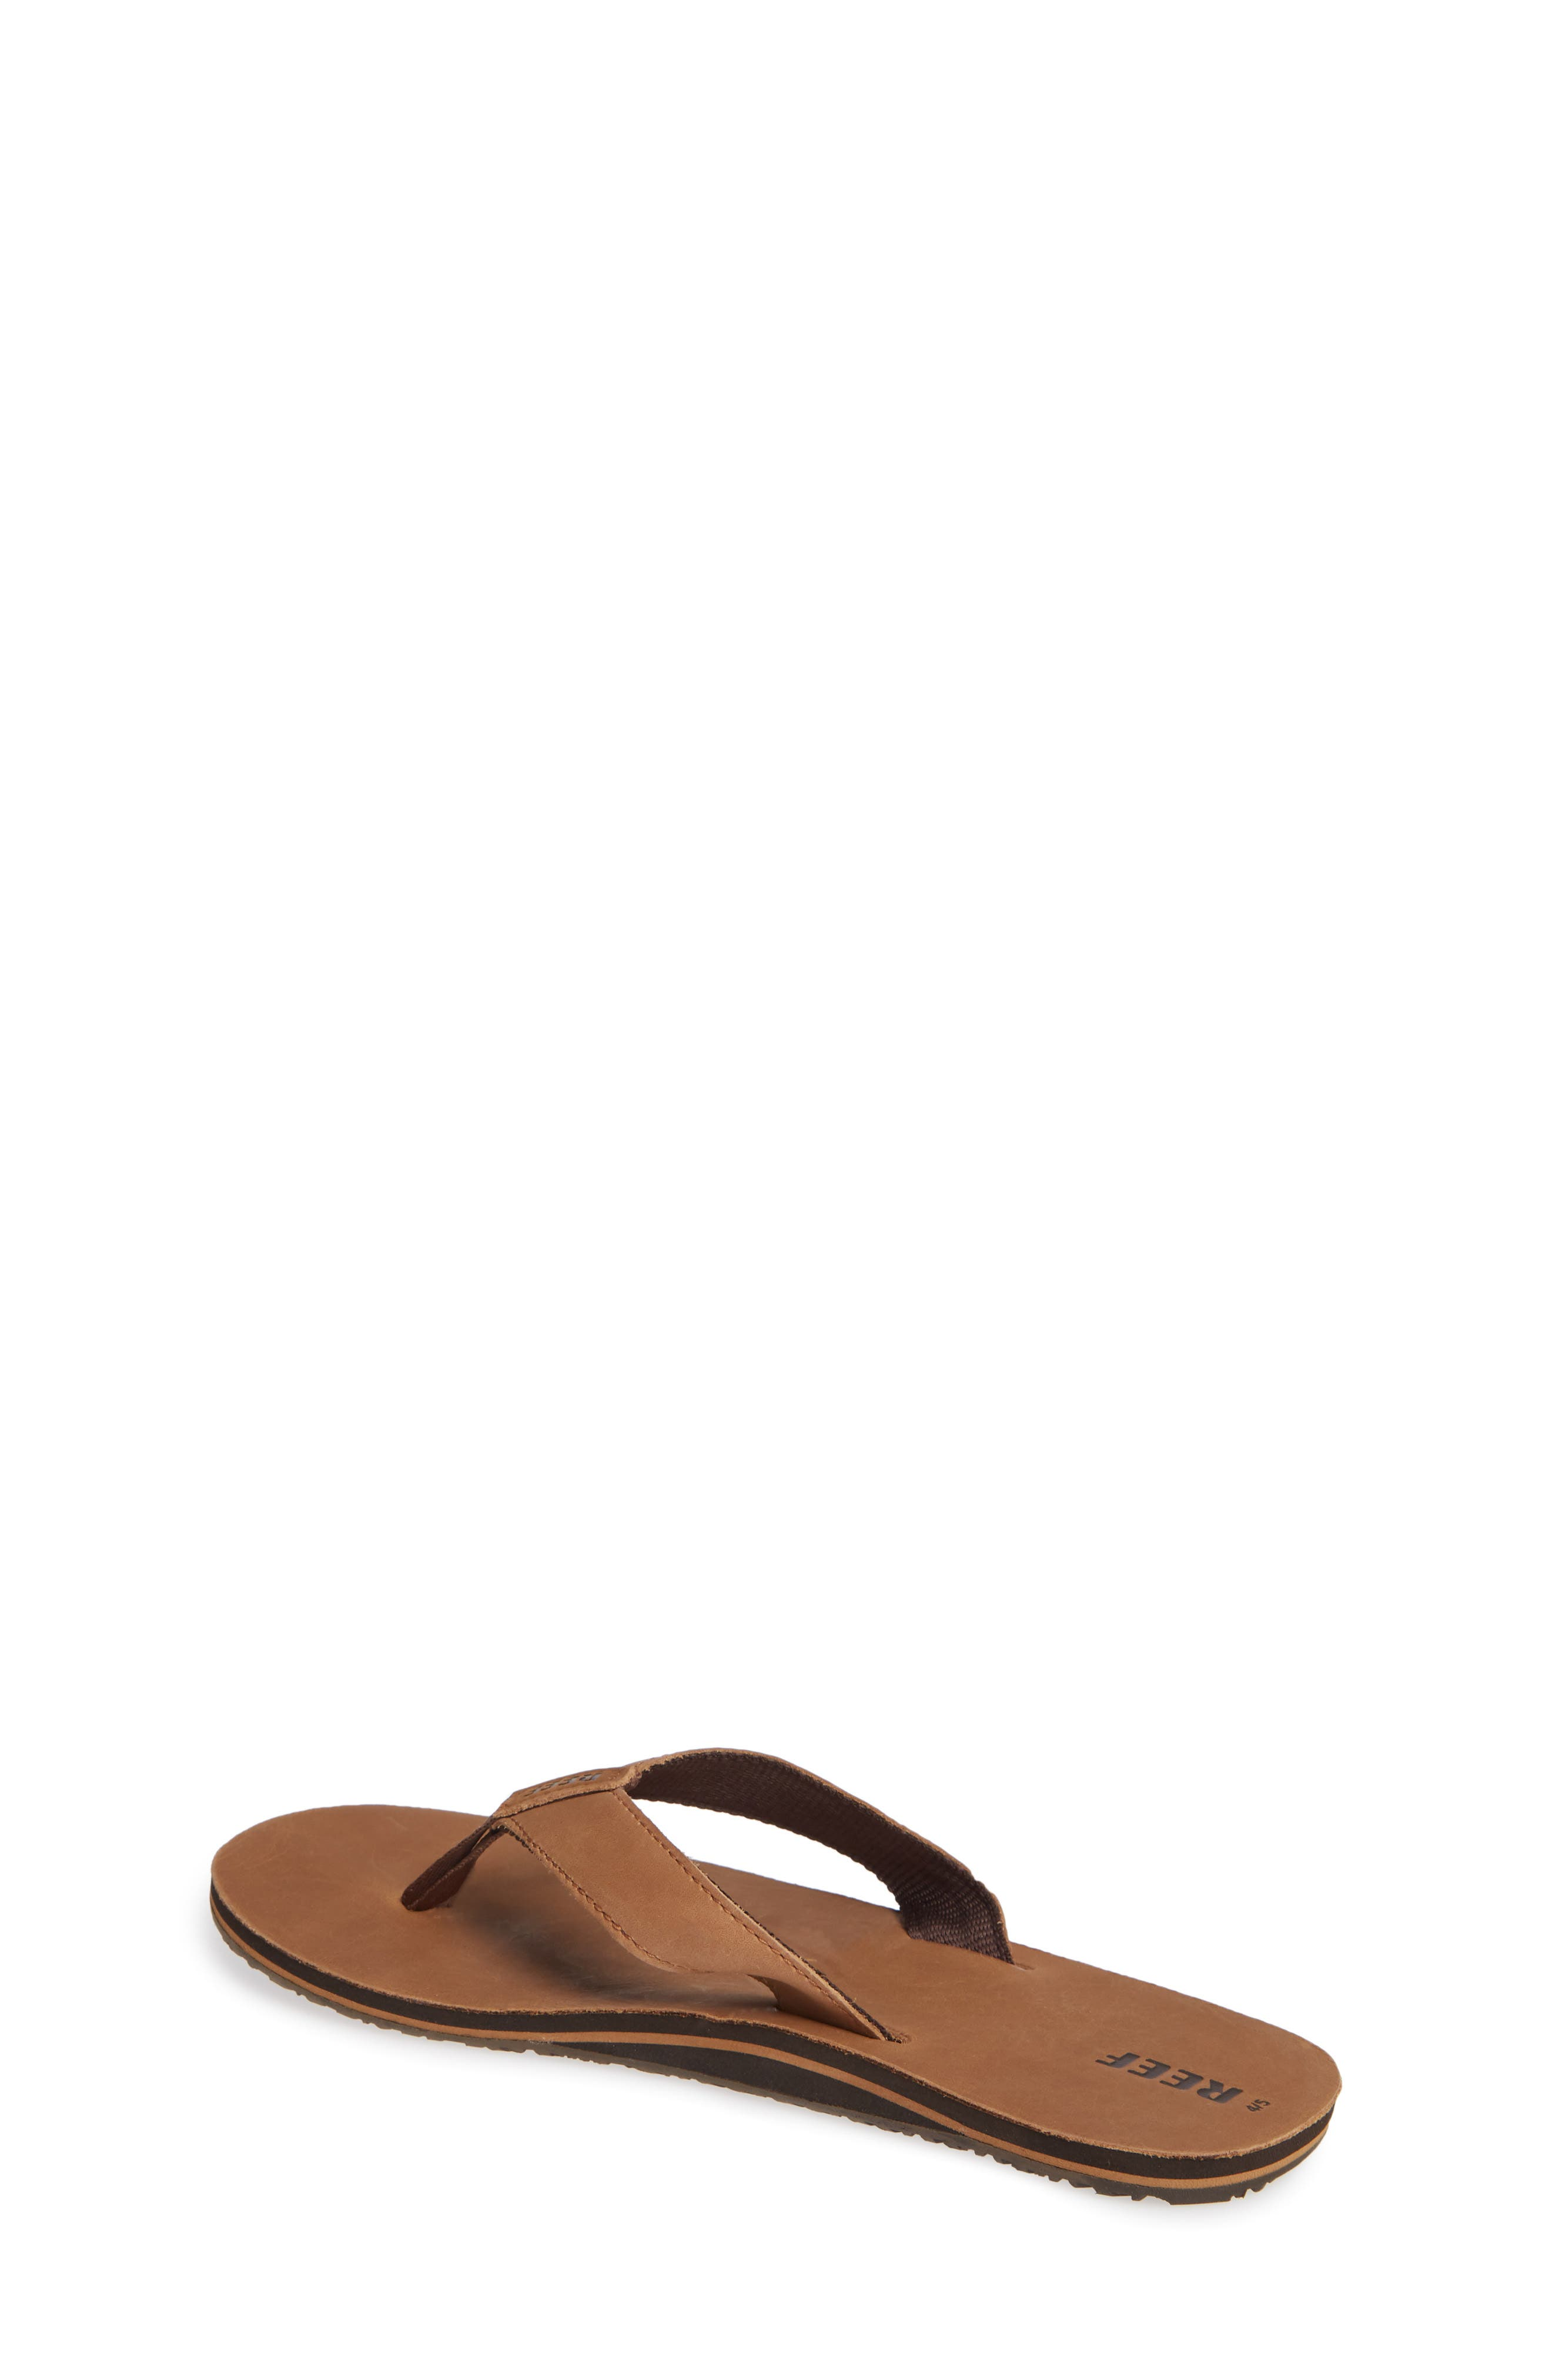 'Grom' Leather Flip-Flop,                             Alternate thumbnail 2, color,                             200